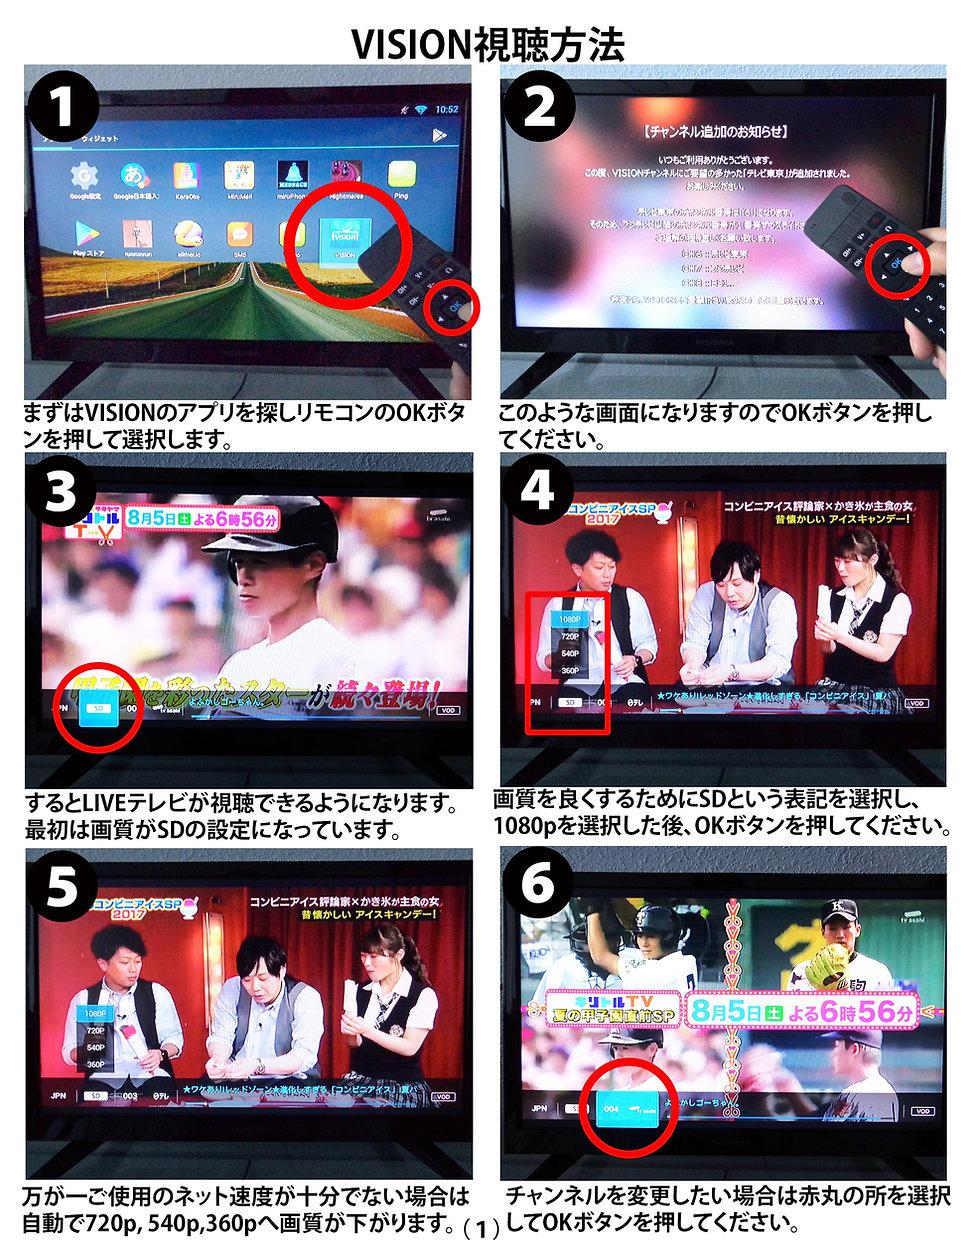 Vision視聴方法1.jpg